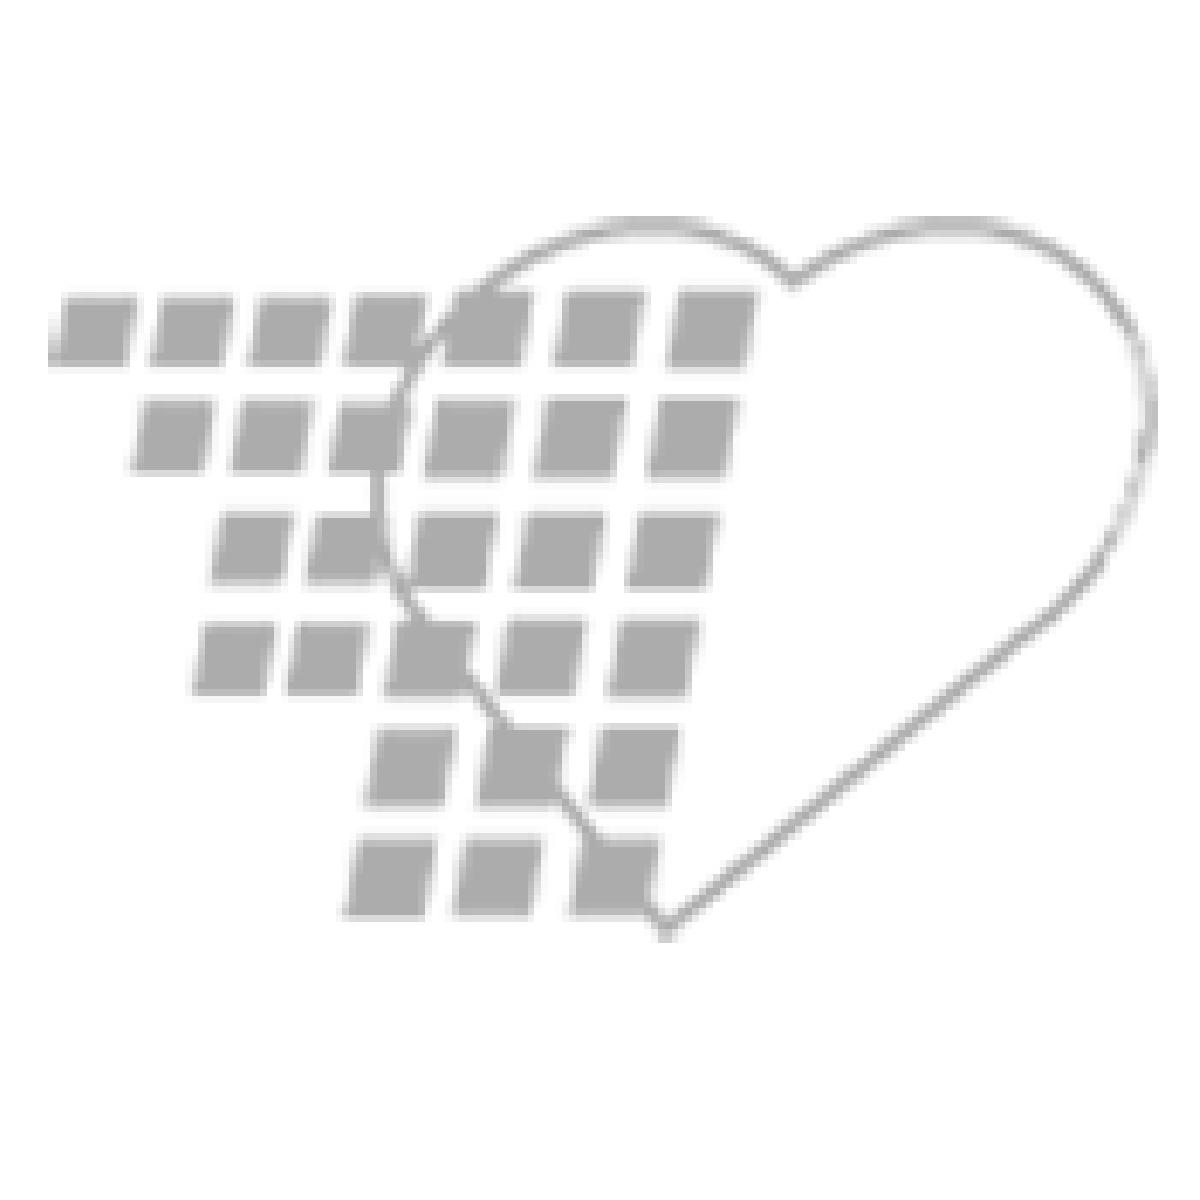 06-93-9002 - Demo Dose®, Vancocn (Vancomycn) 10 mL 1g